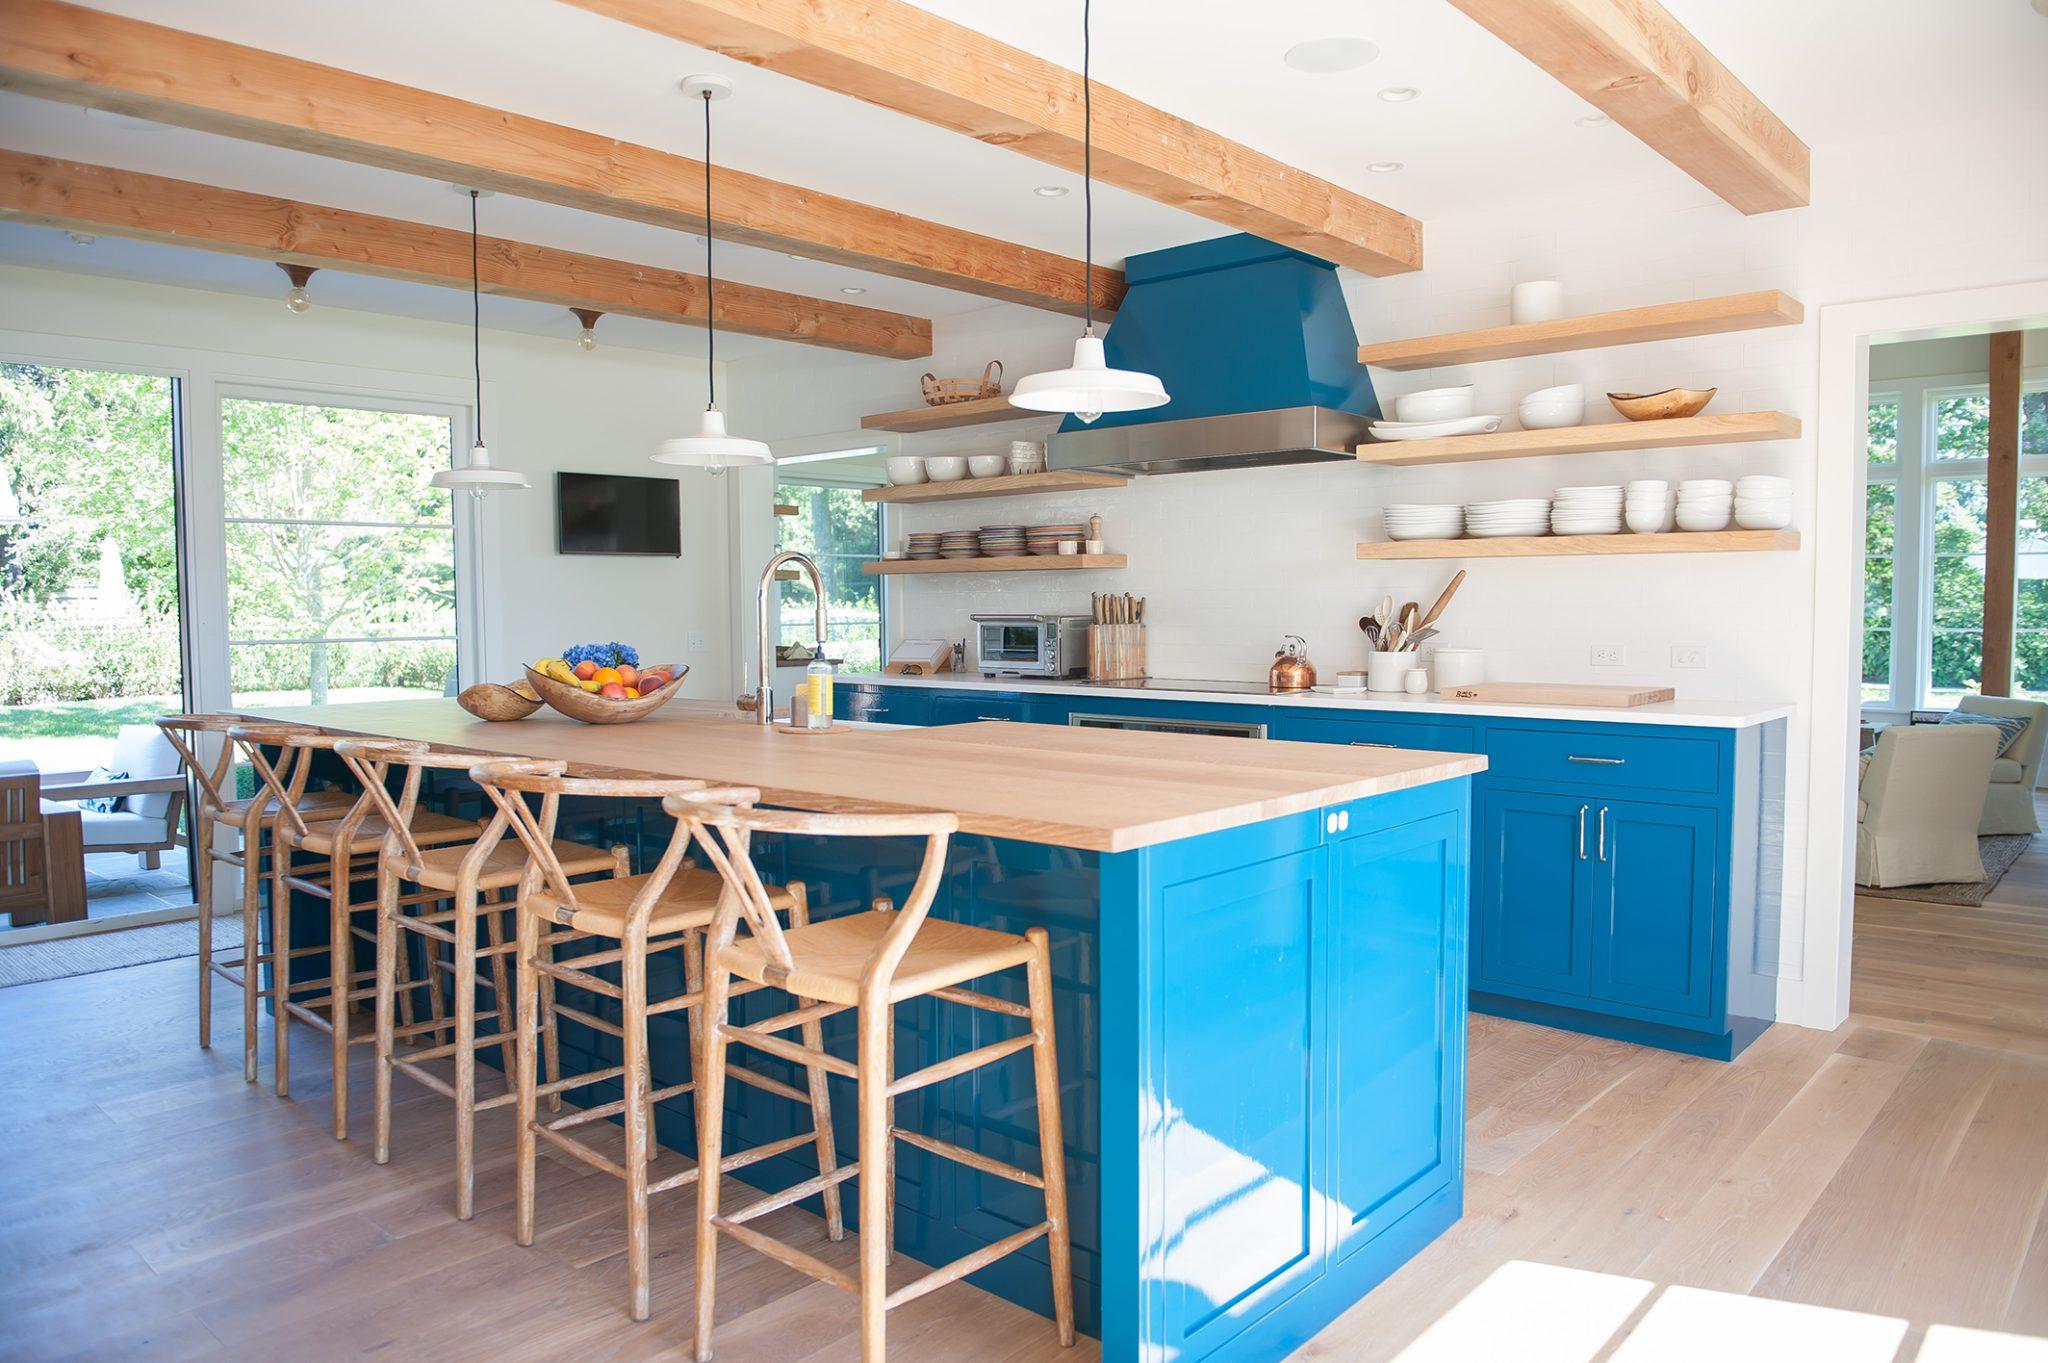 Coastal Contemporary - Kitchen by Hannah Childs Interior Design